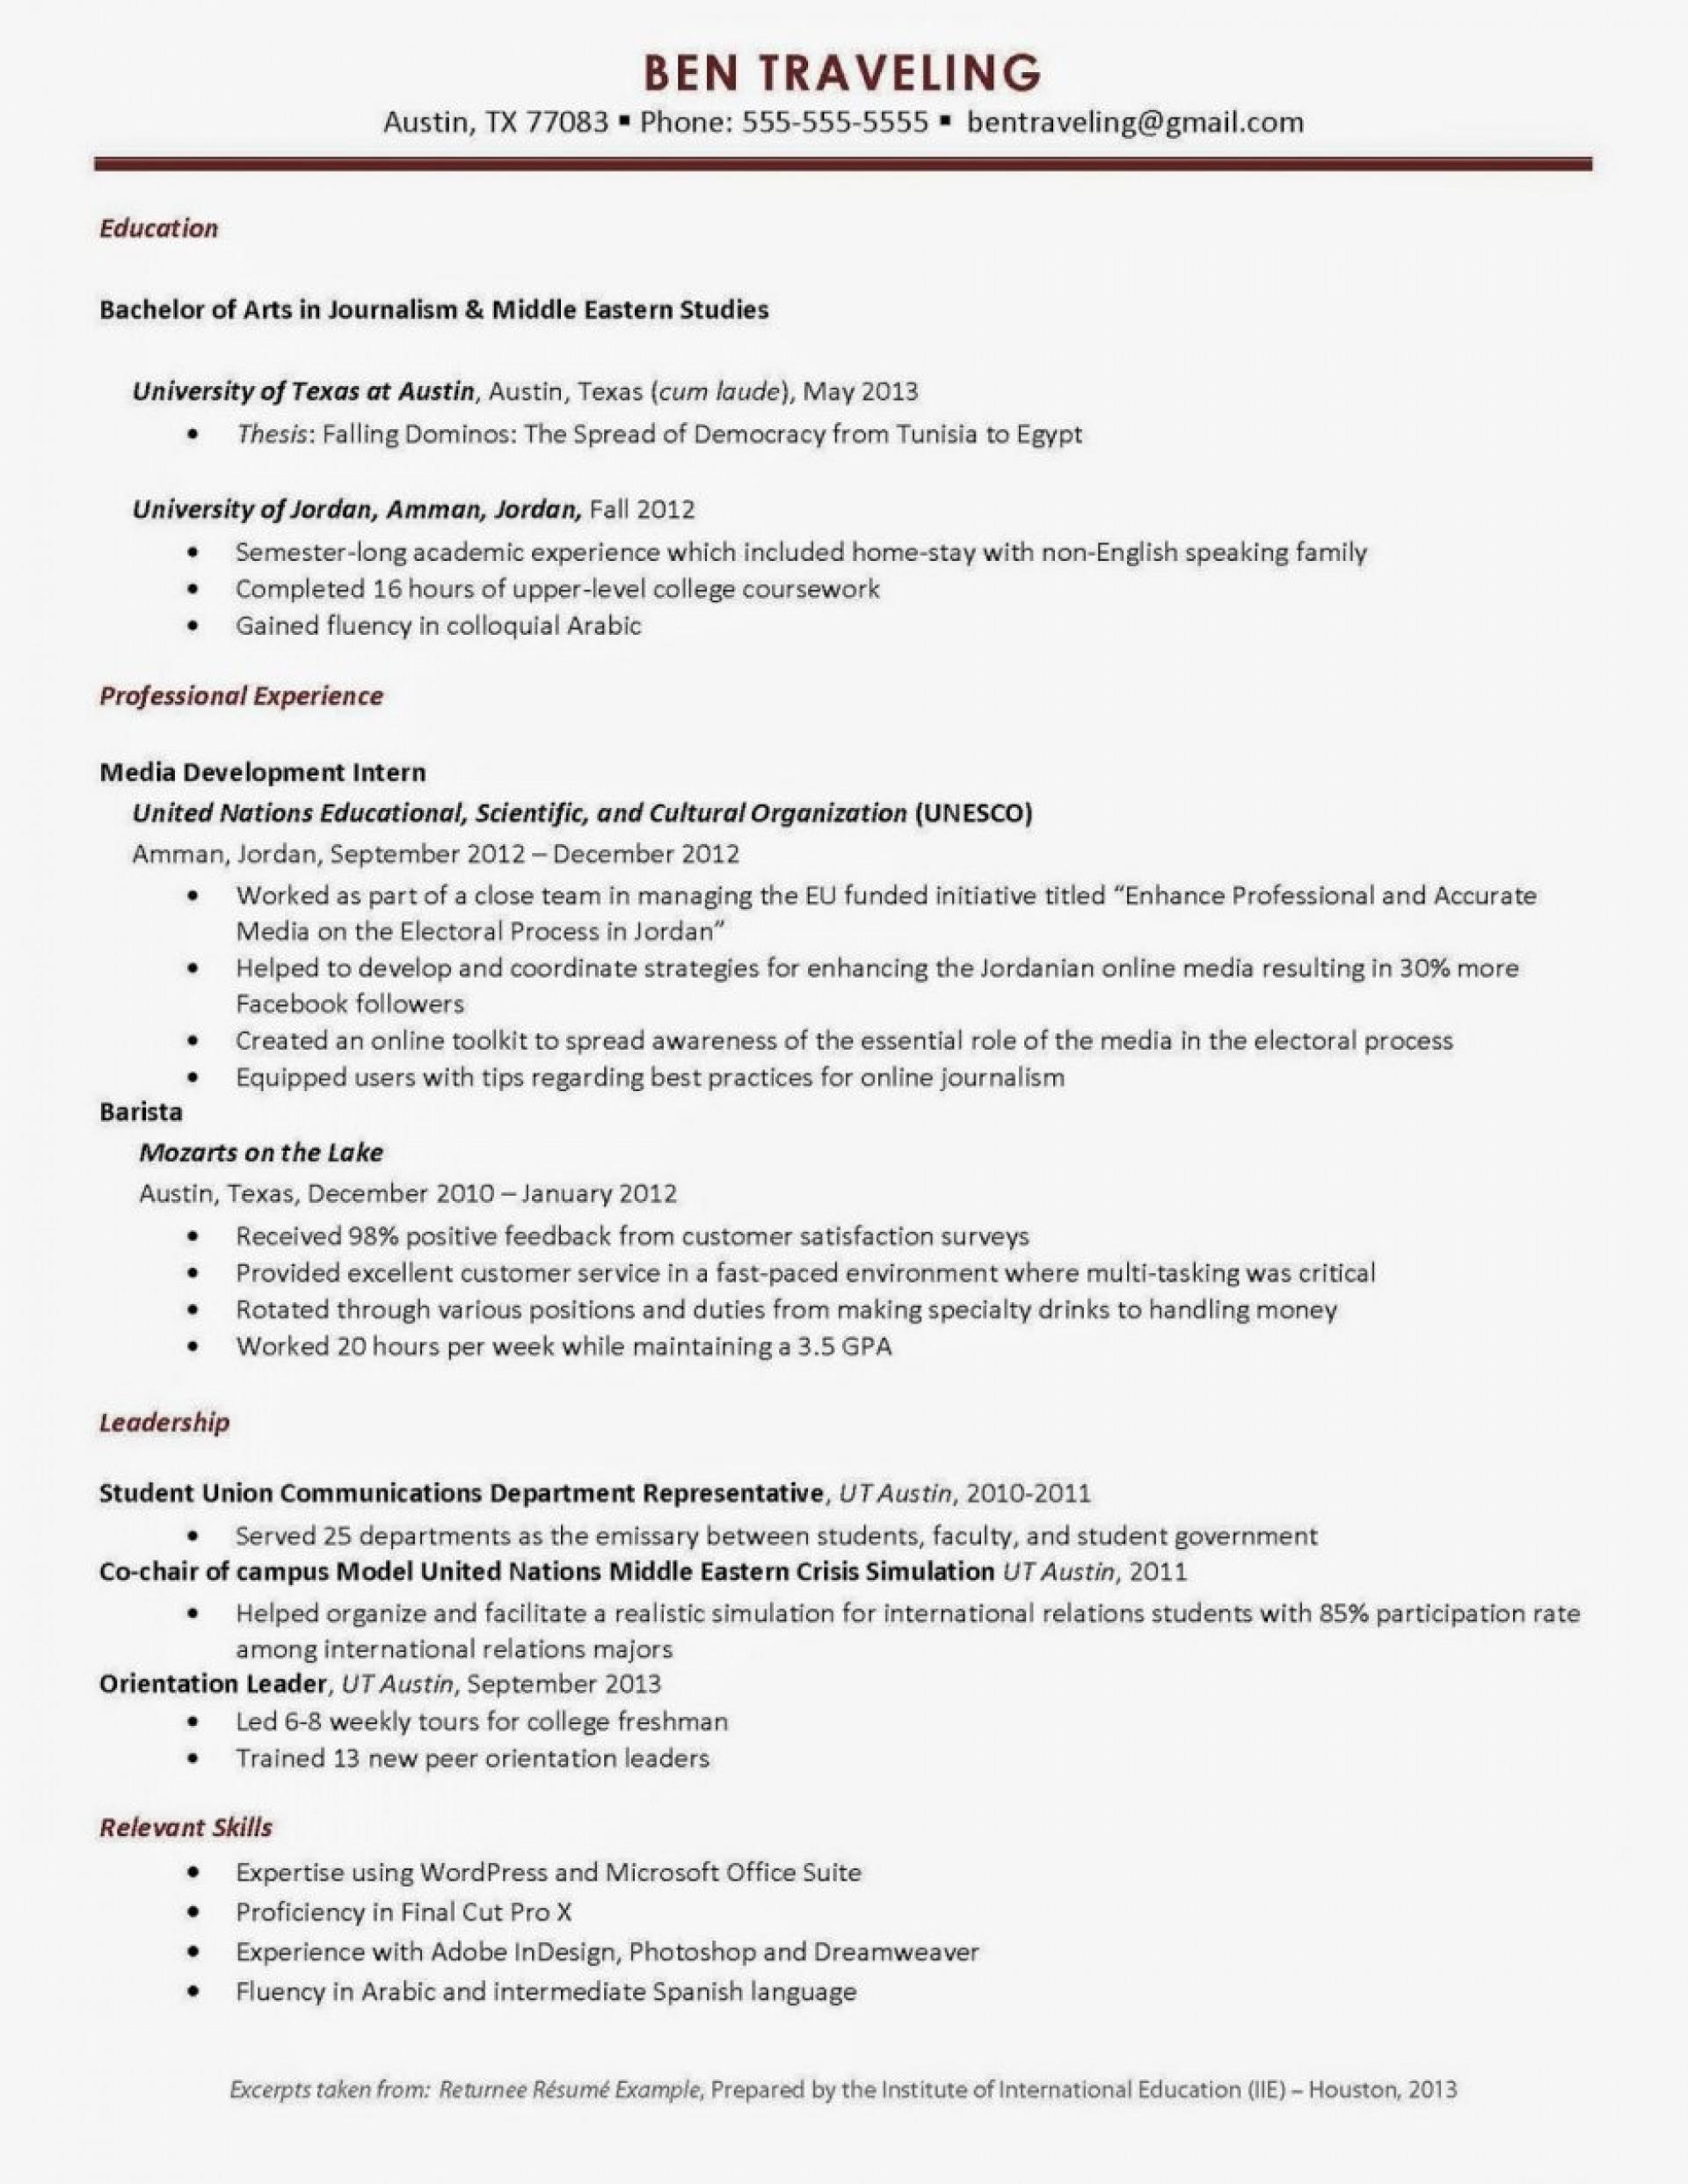 018 Study Abroad Essay Example Morethantravelworkshop Resume